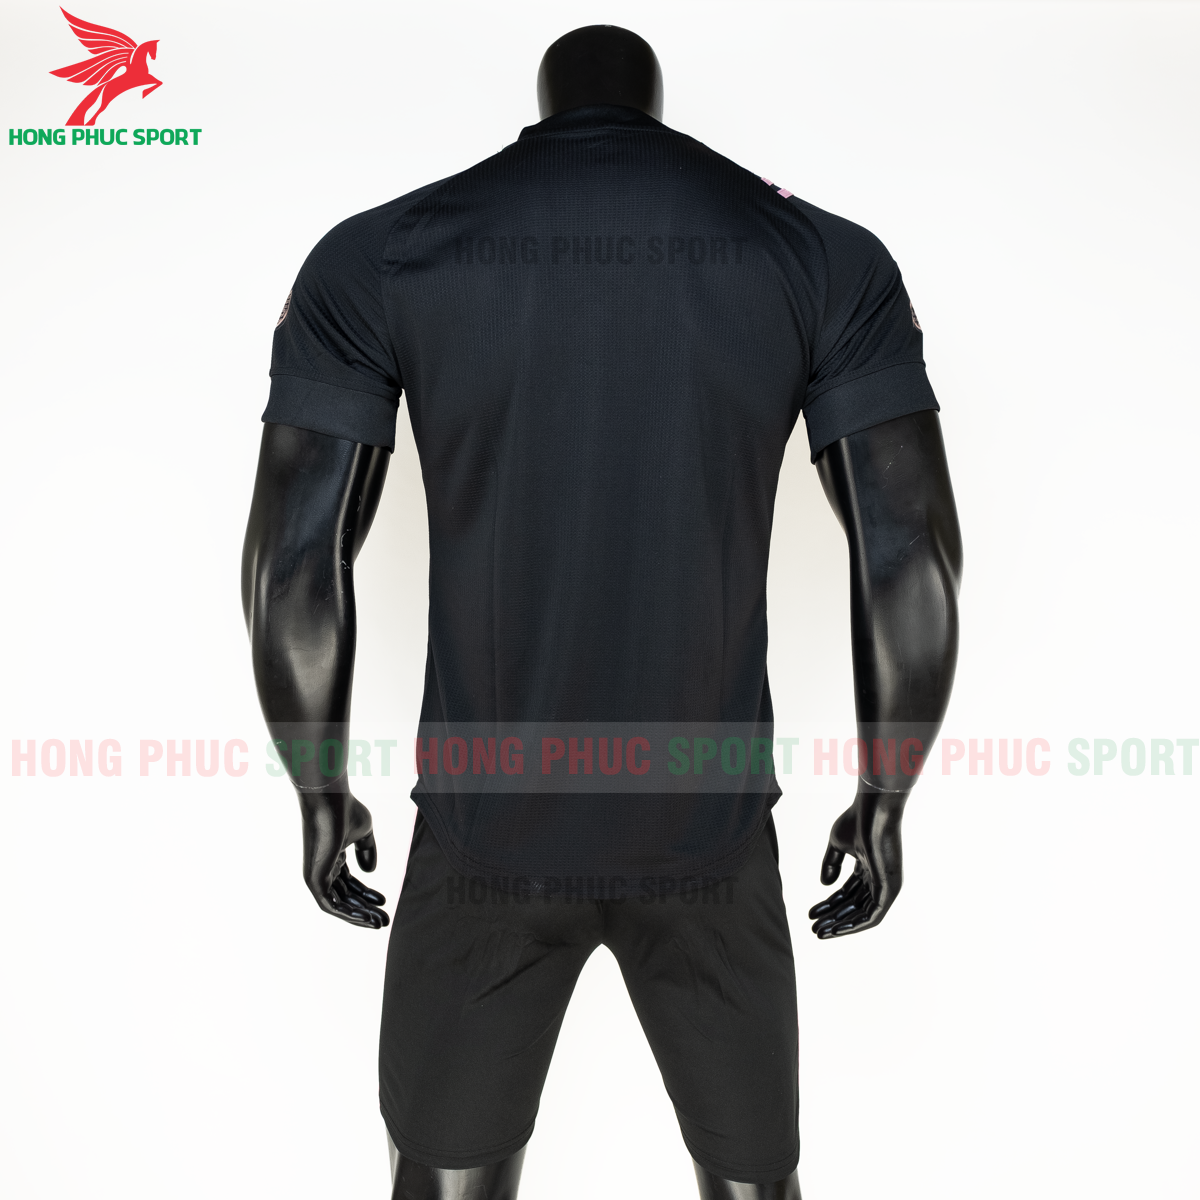 https://cdn.hongphucsport.com/unsafe/s4.shopbay.vn/files/285/ao-inter-miami-20-21-san-khach-hang-thailand-6-5fa0d29f08d17.png